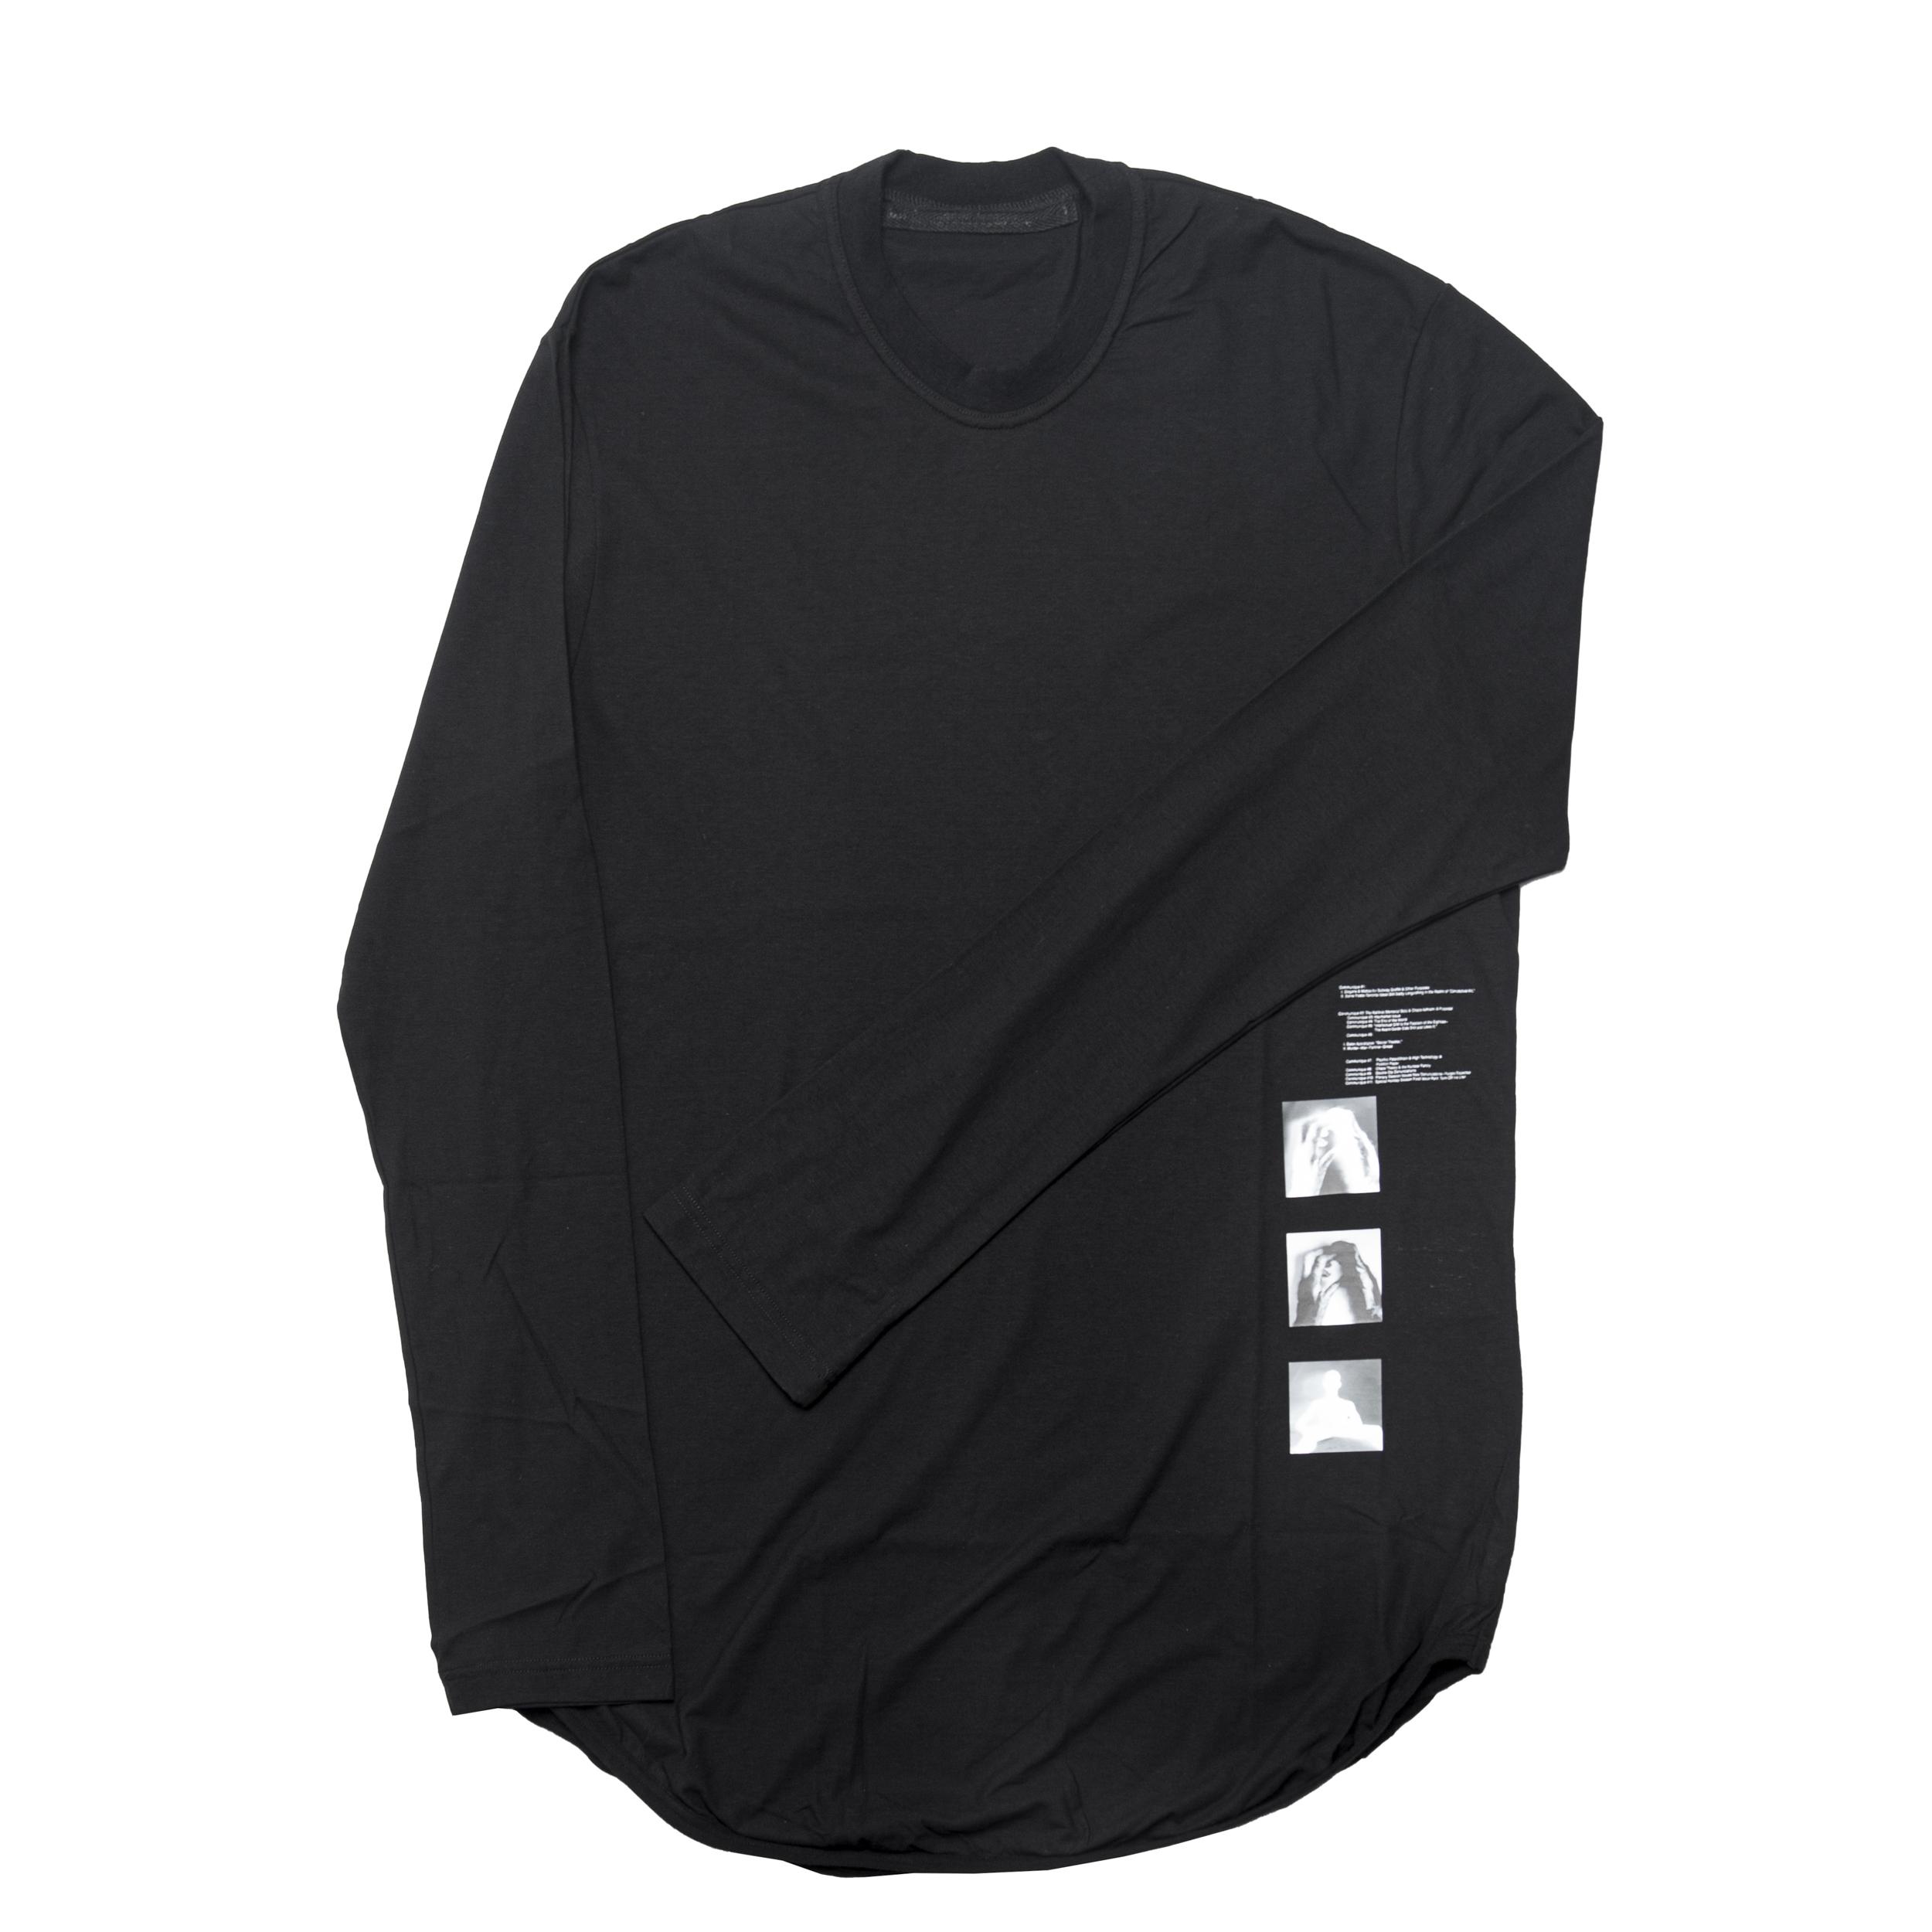 677CPM10-BLACK / T. A. Z. ロングスリーブラウンド Tシャツ